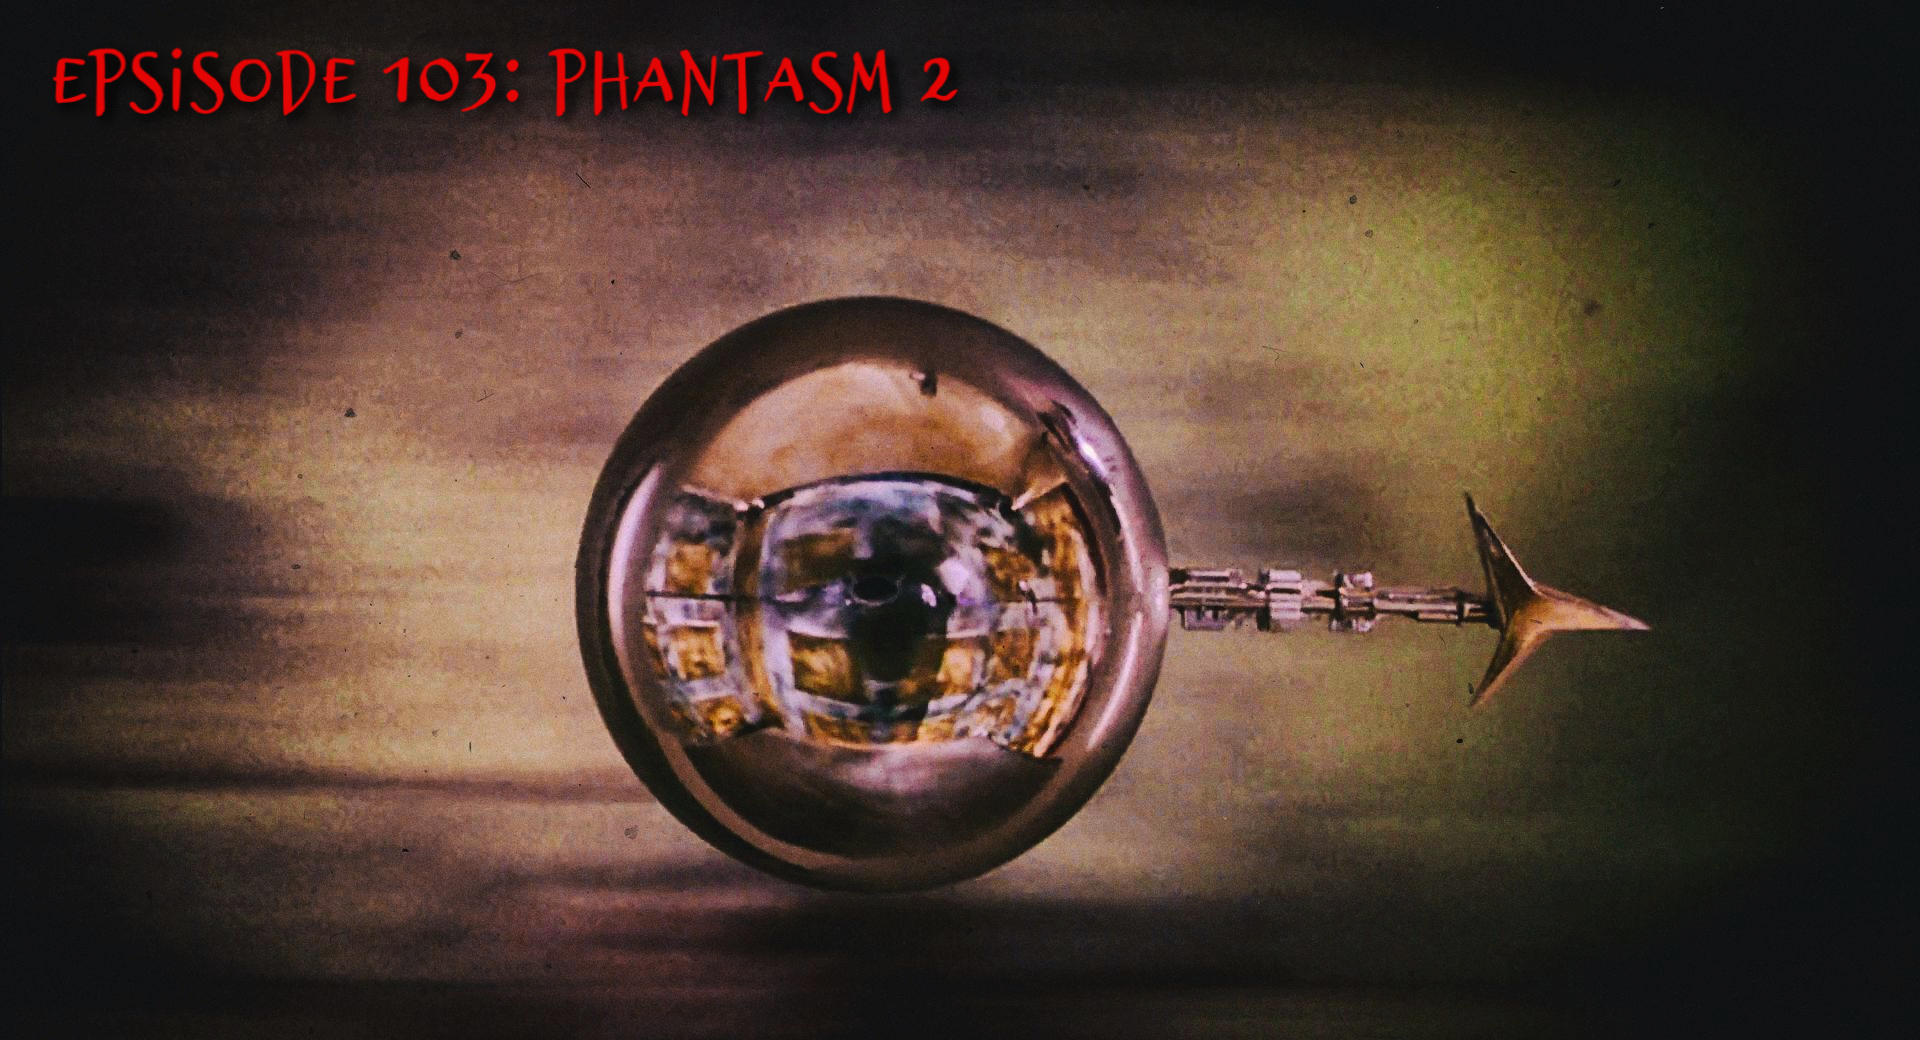 phantasm2-sphere-title.jpg